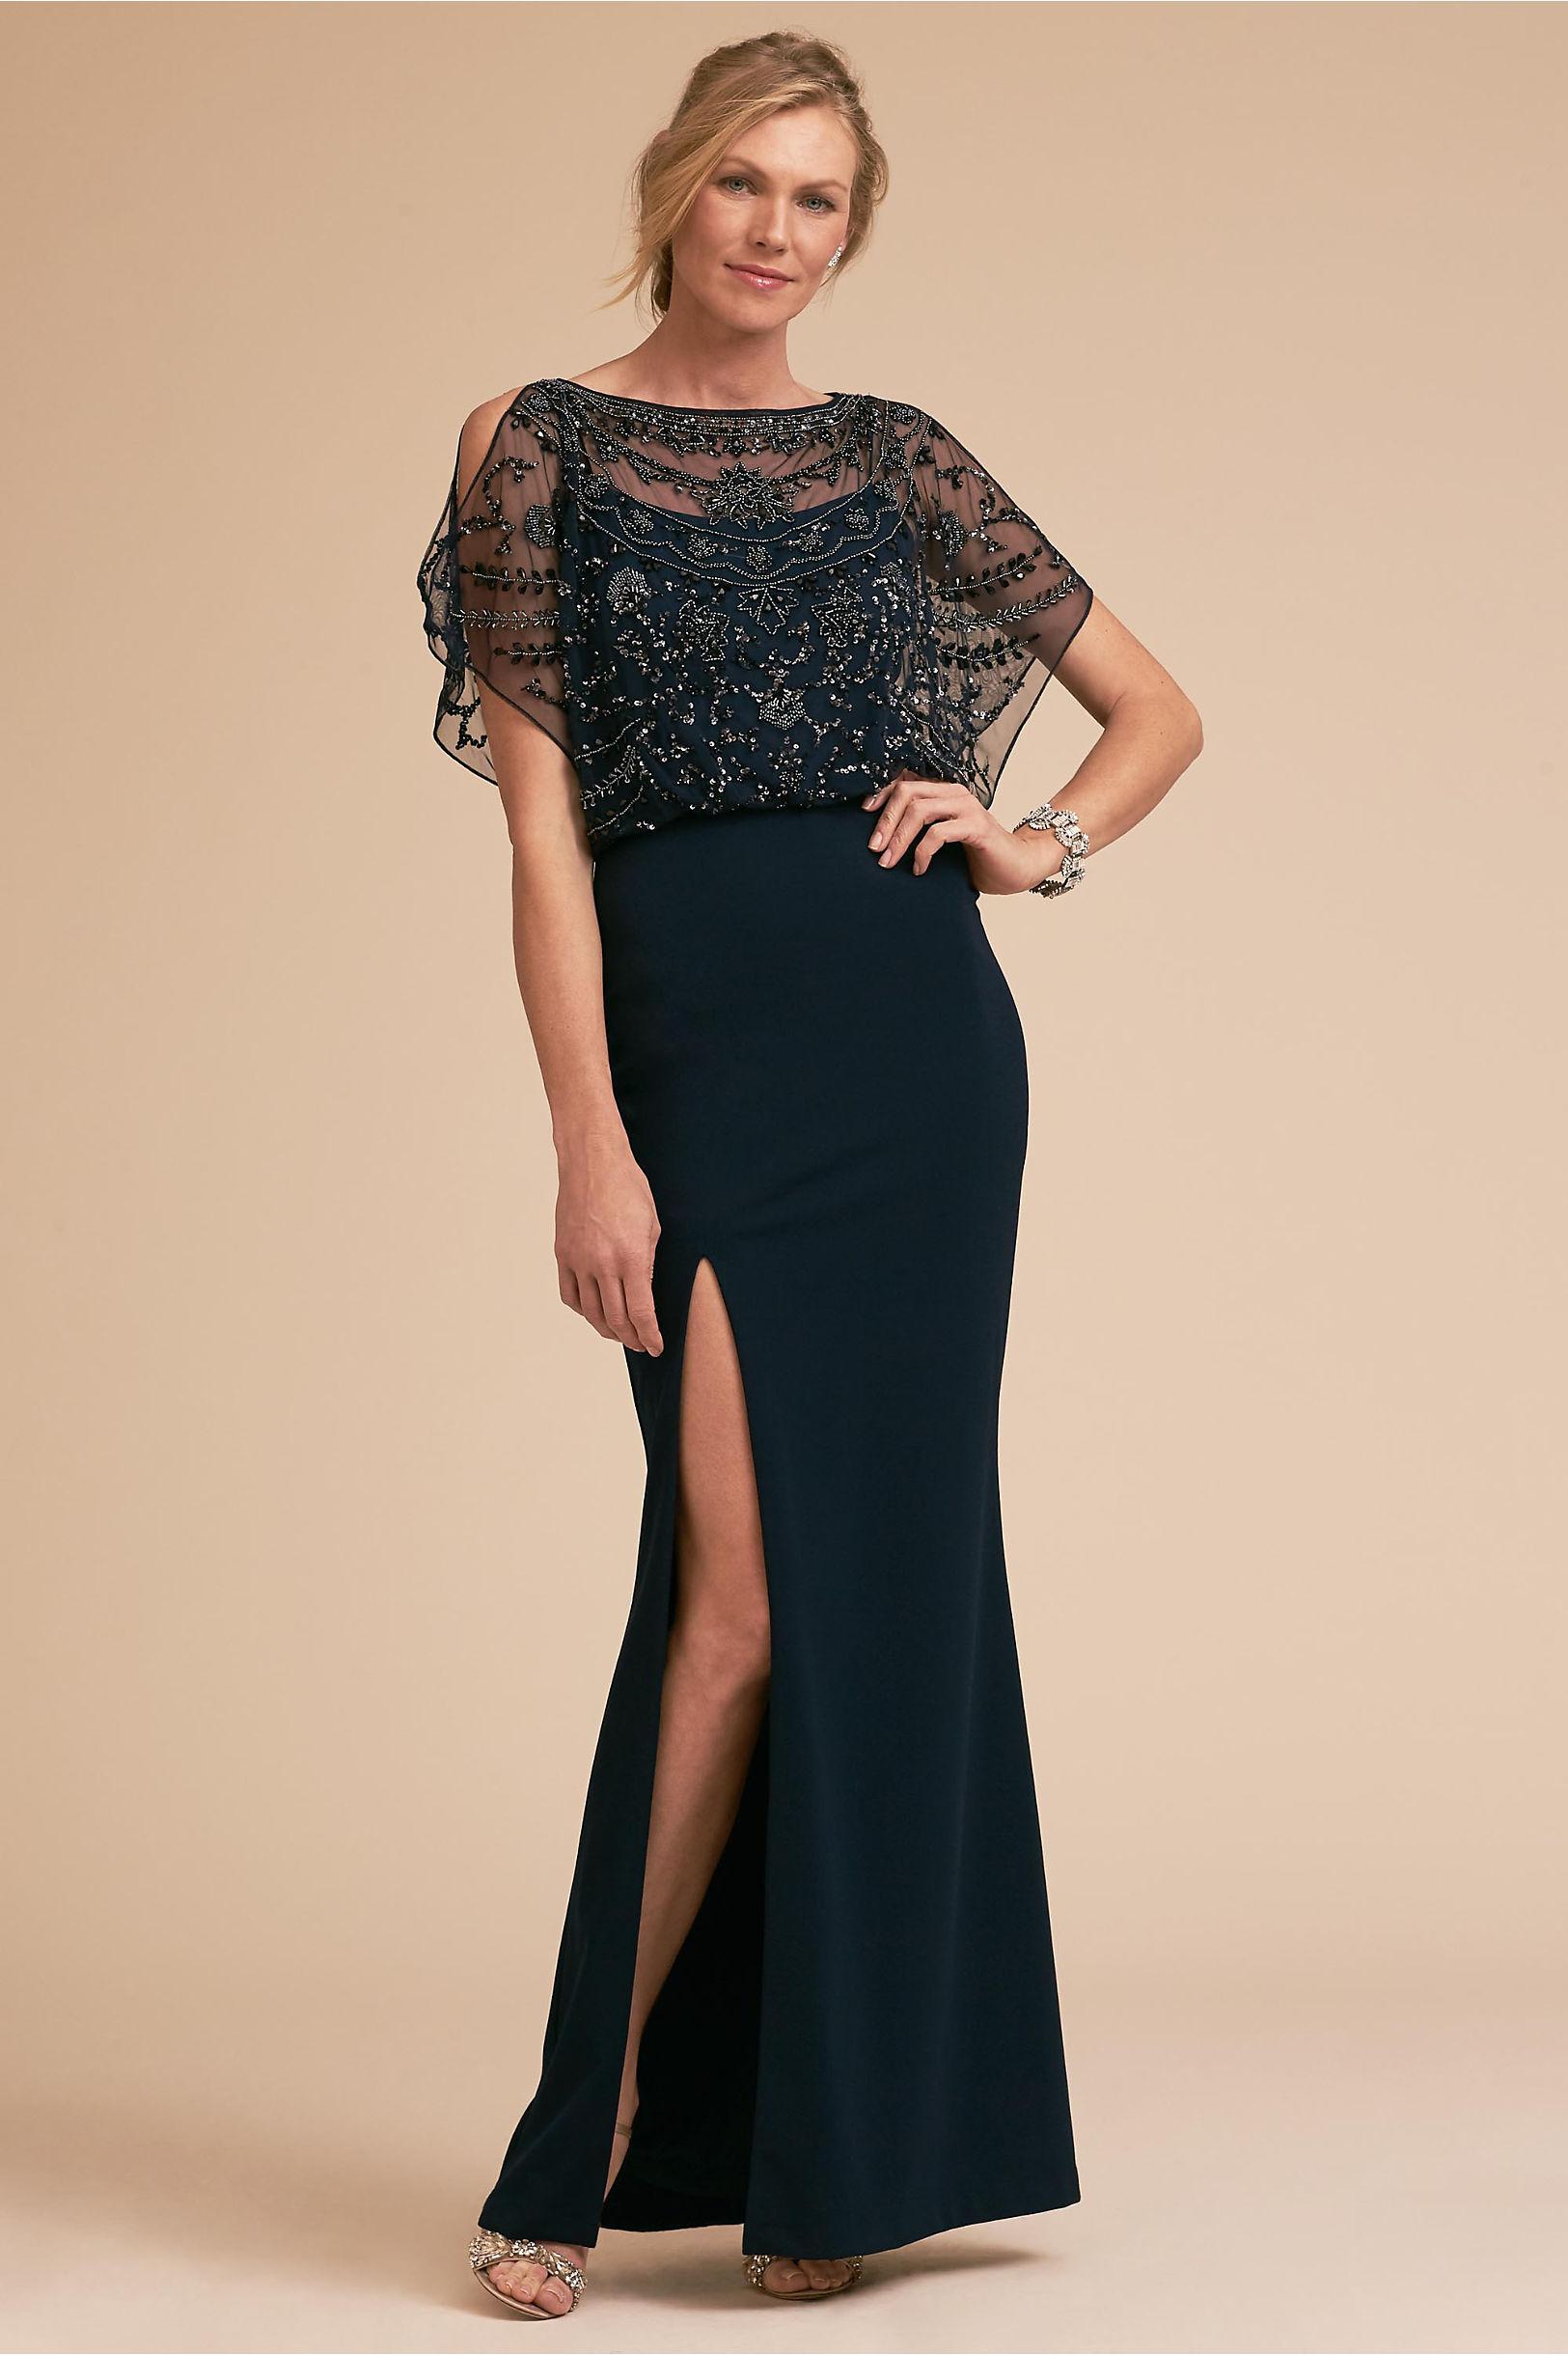 Symphony Dress in Sale | BHLDN